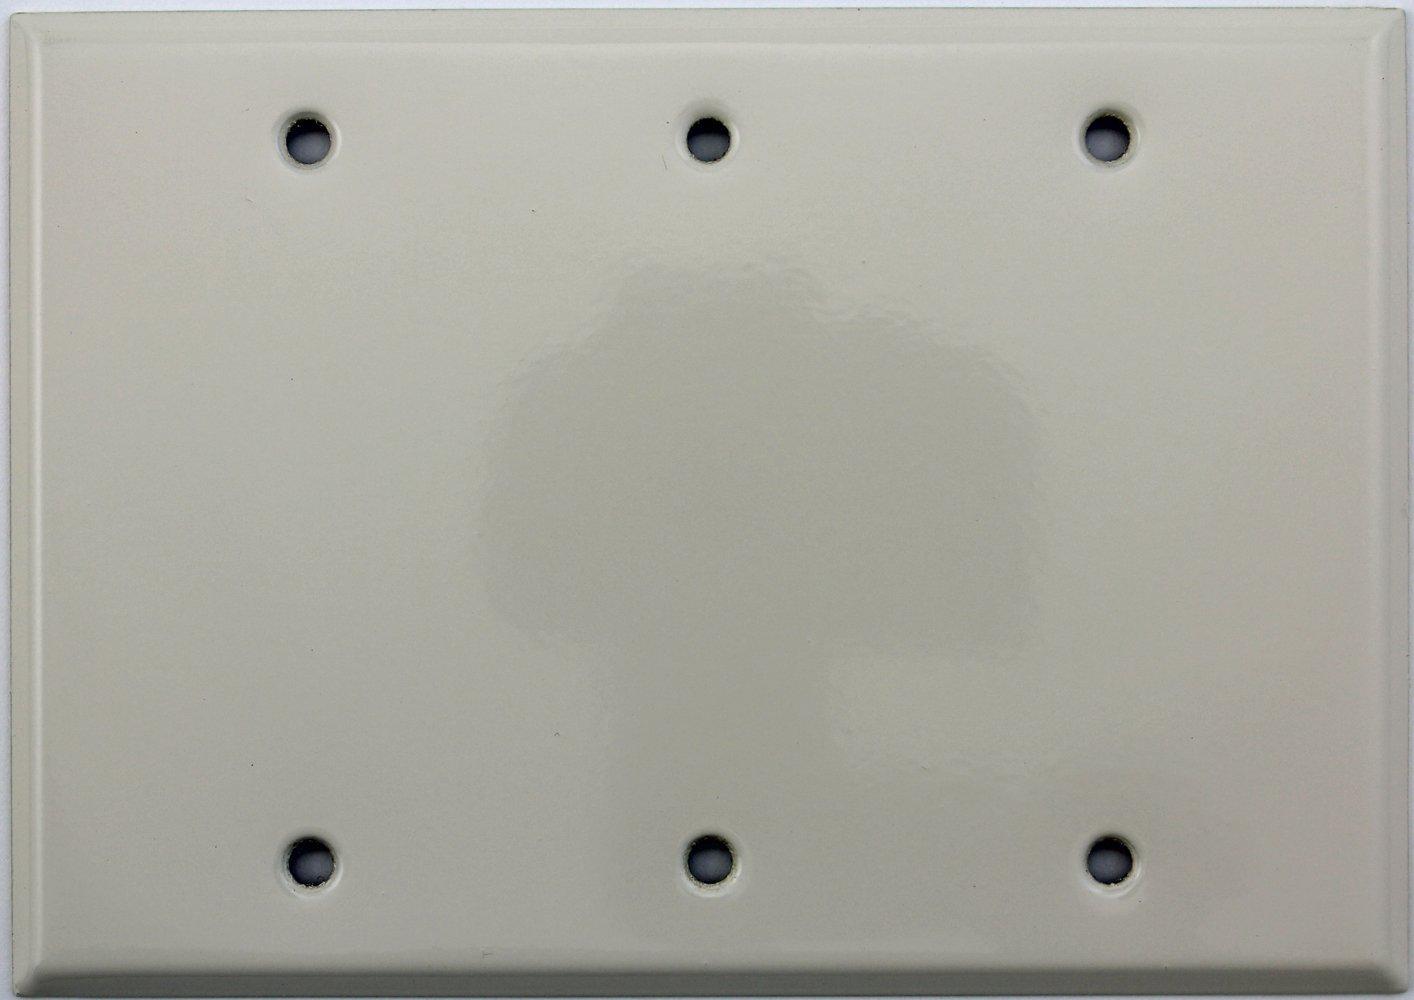 Light Almond Three Gang Blank Switch Plate - - Amazon.com